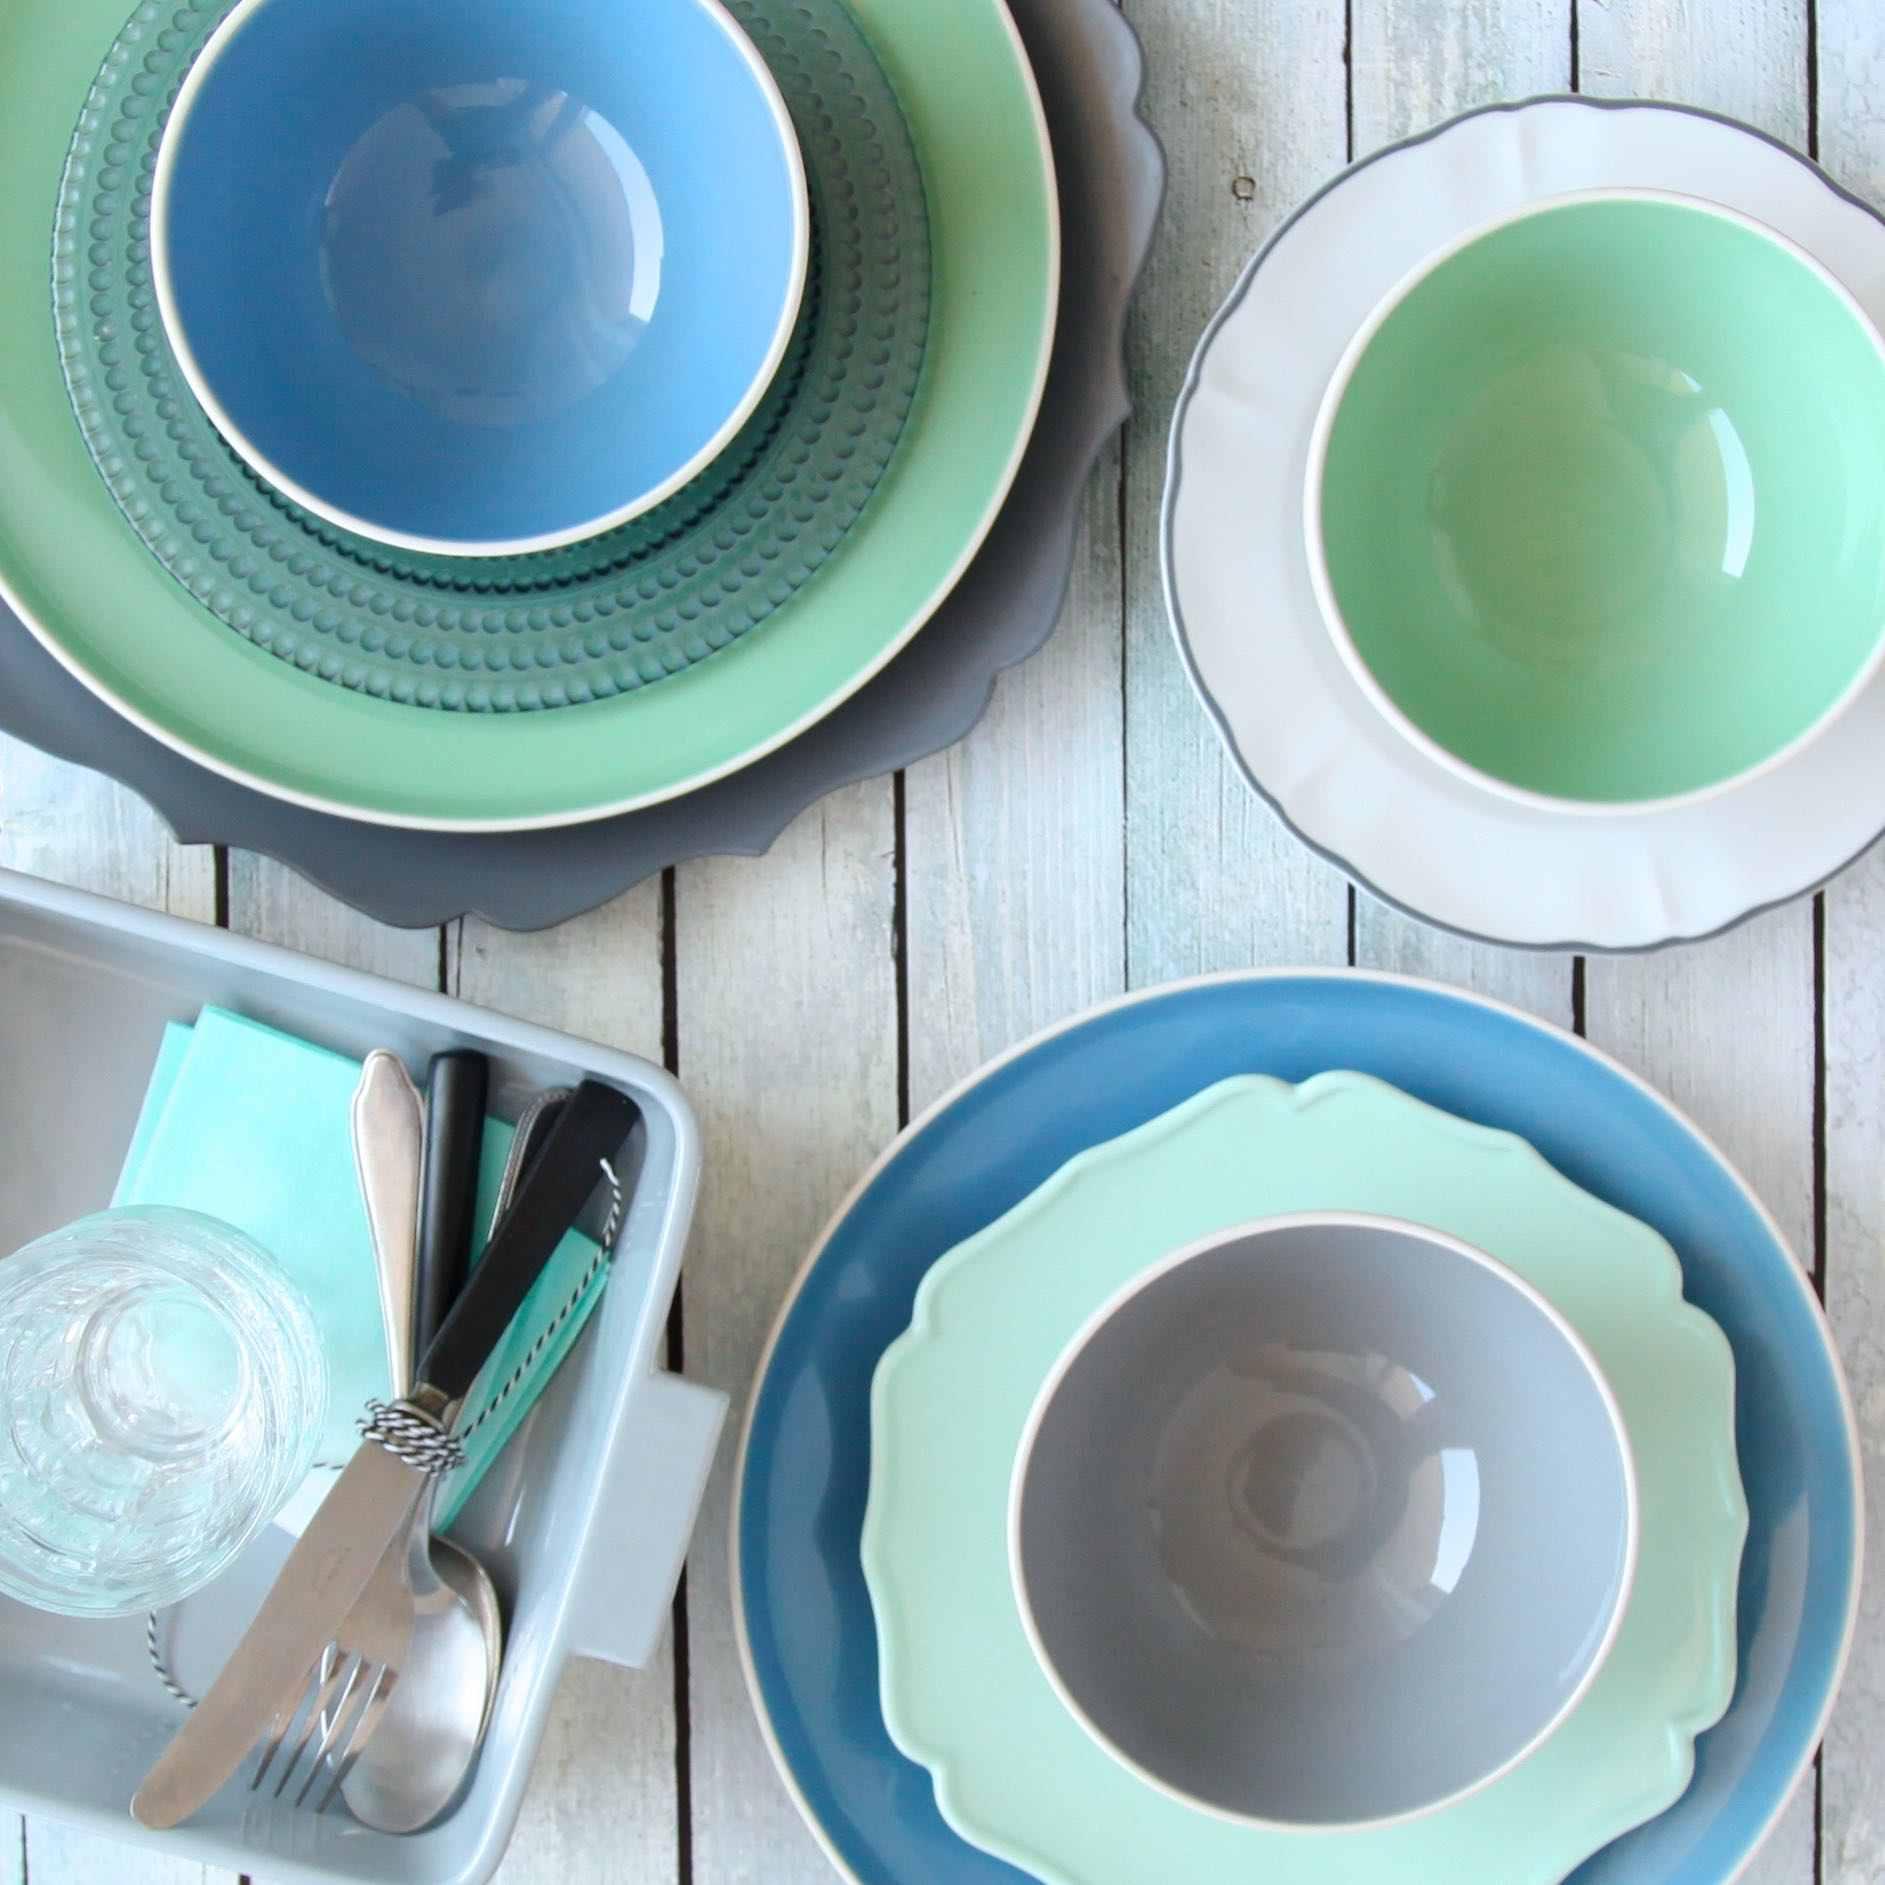 Ontwerp keuken accessoires page 865 for Bitossi shop on line